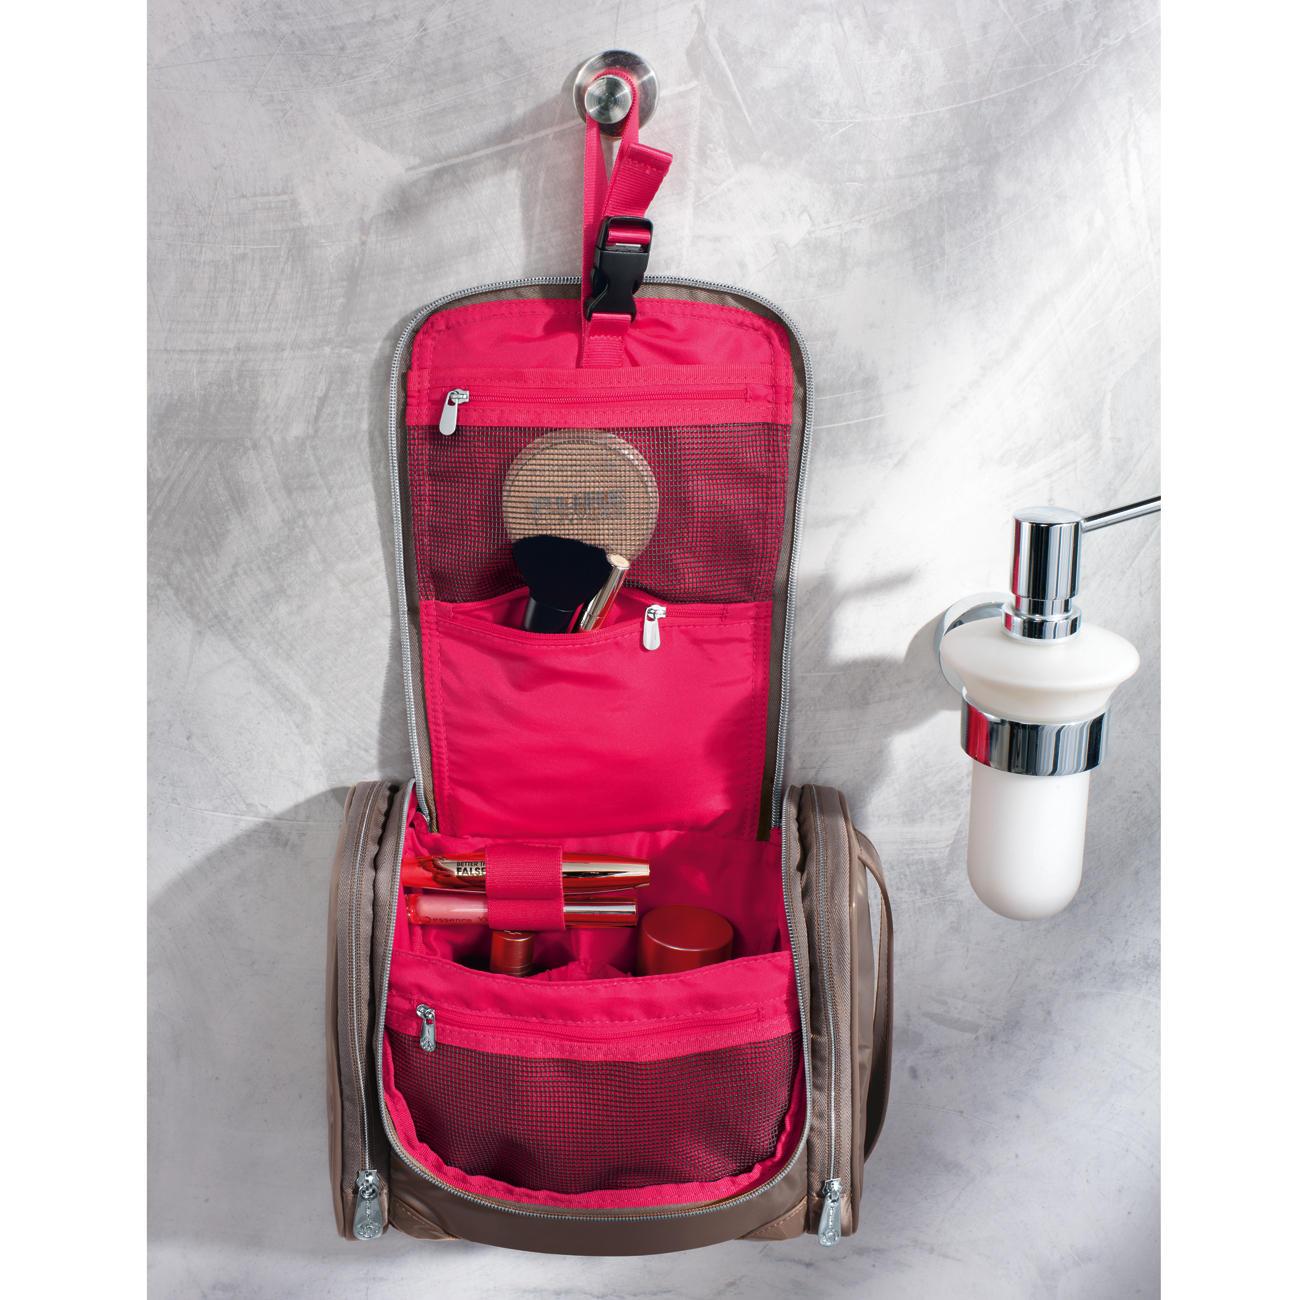 acheter samsonite 174 trousse de toilette en ligne pas cher